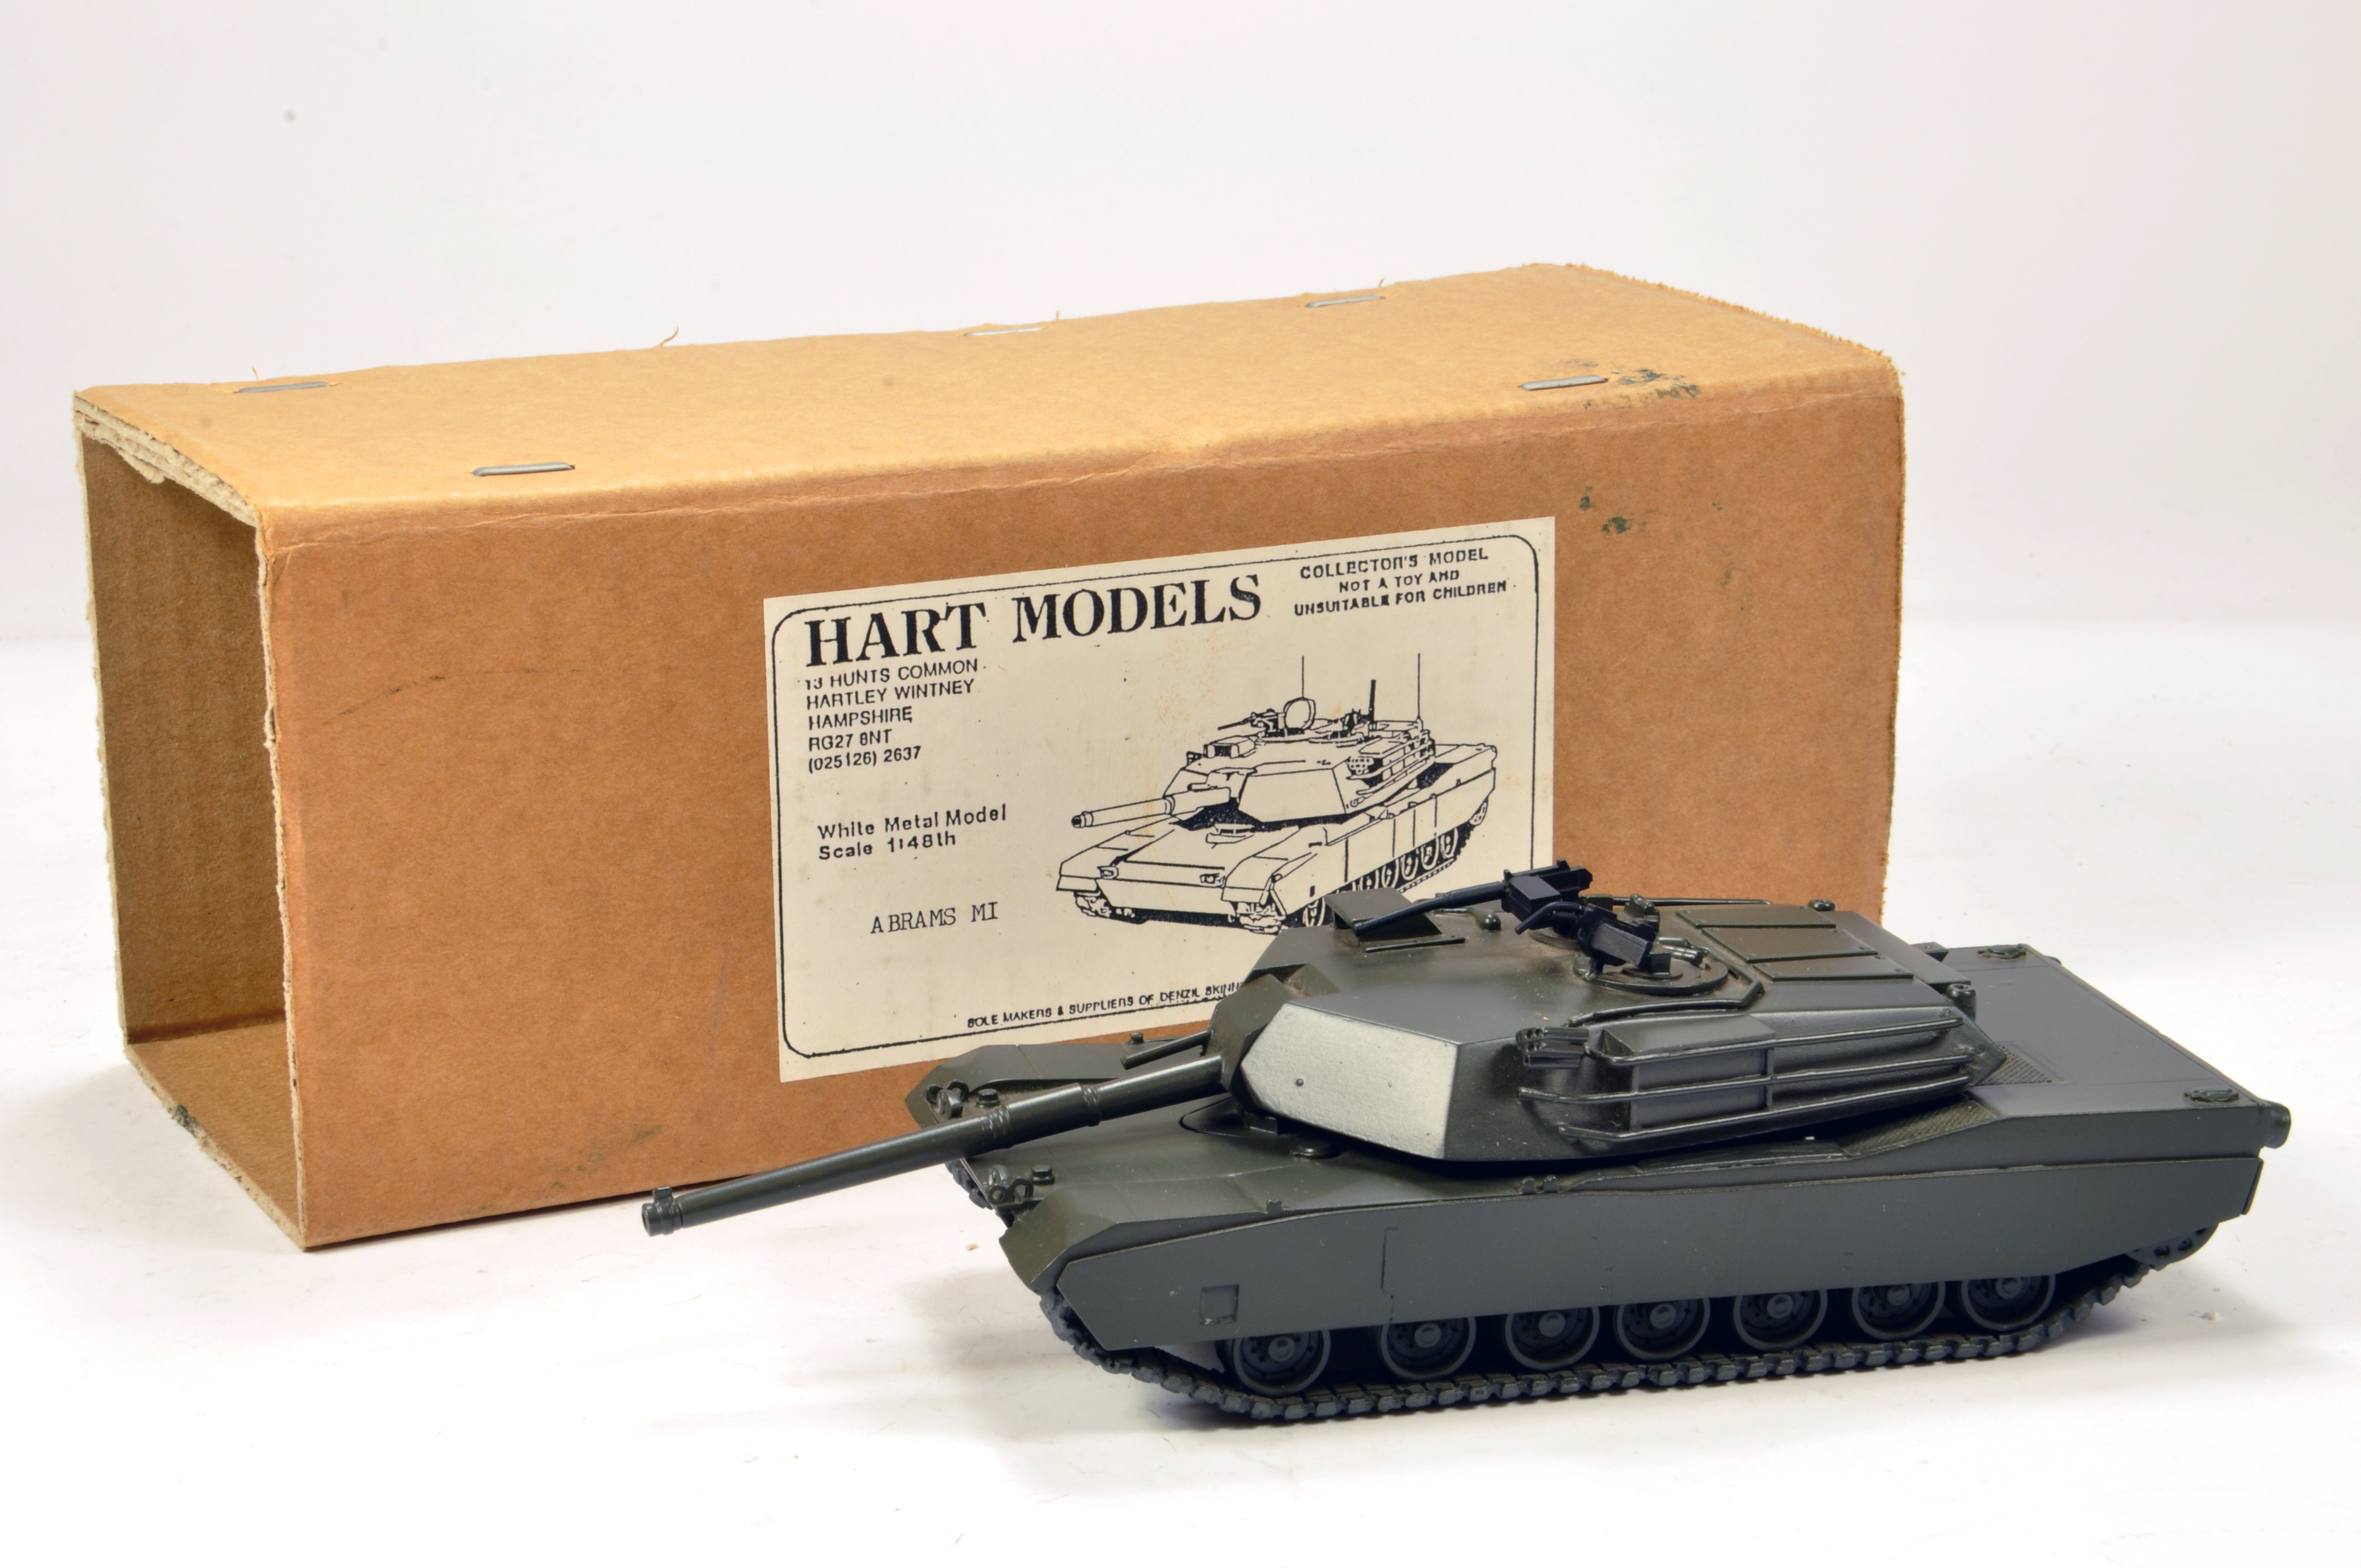 Lot 1098 - Hart Models 1/48 White Metal Factory Built M1 Abrams US Tank. Beautiful hand built model is E.